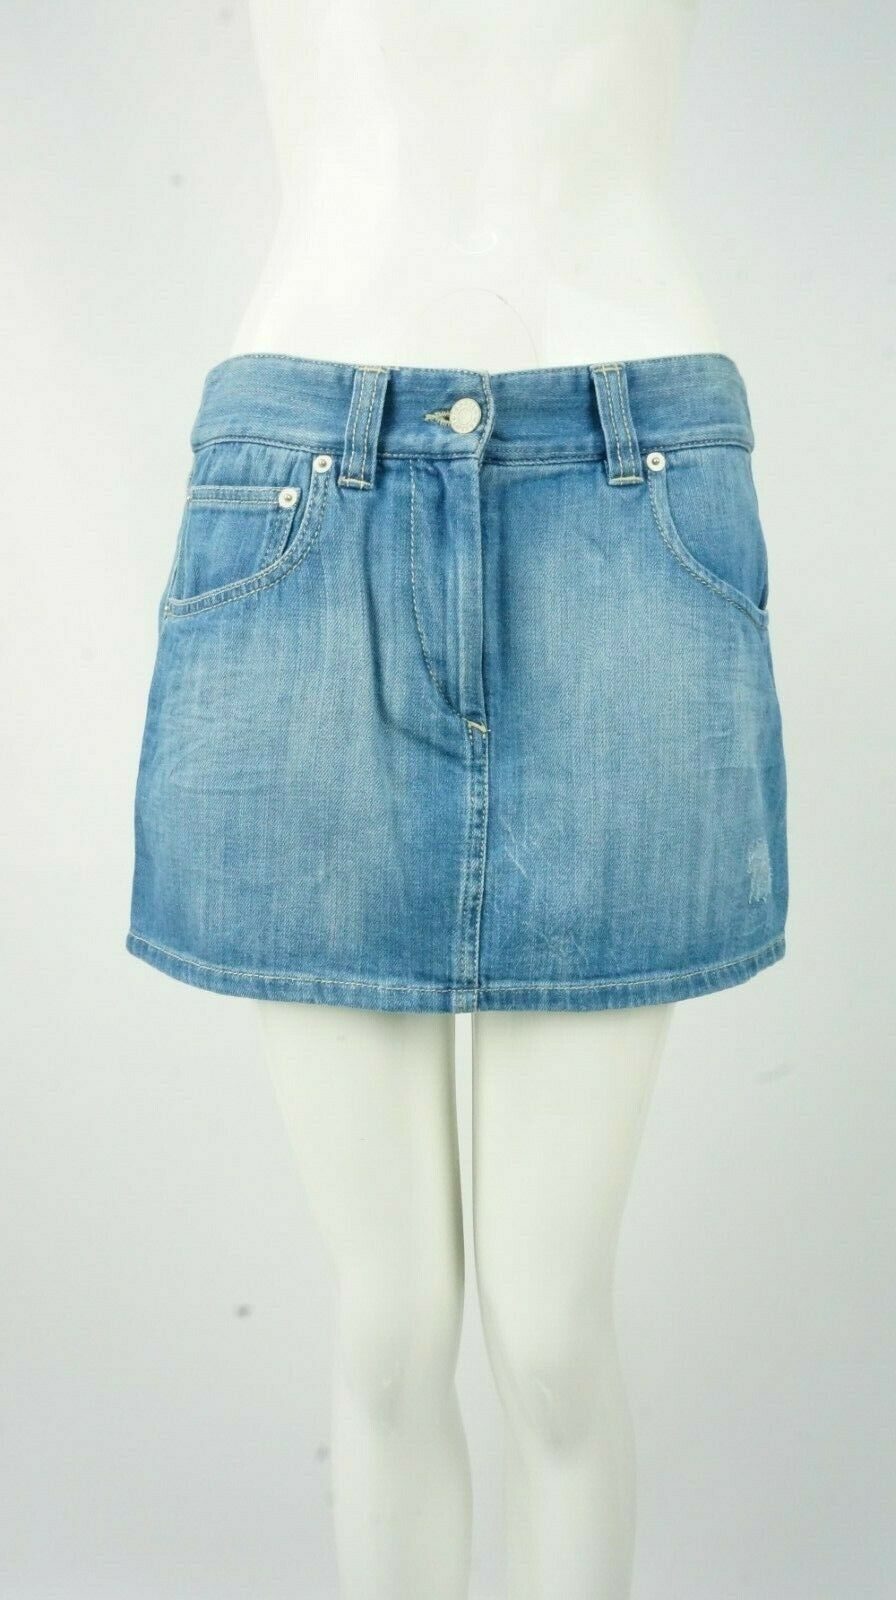 Isabel Marant Size 1 Denim Mini Skirt BNWTS RRP